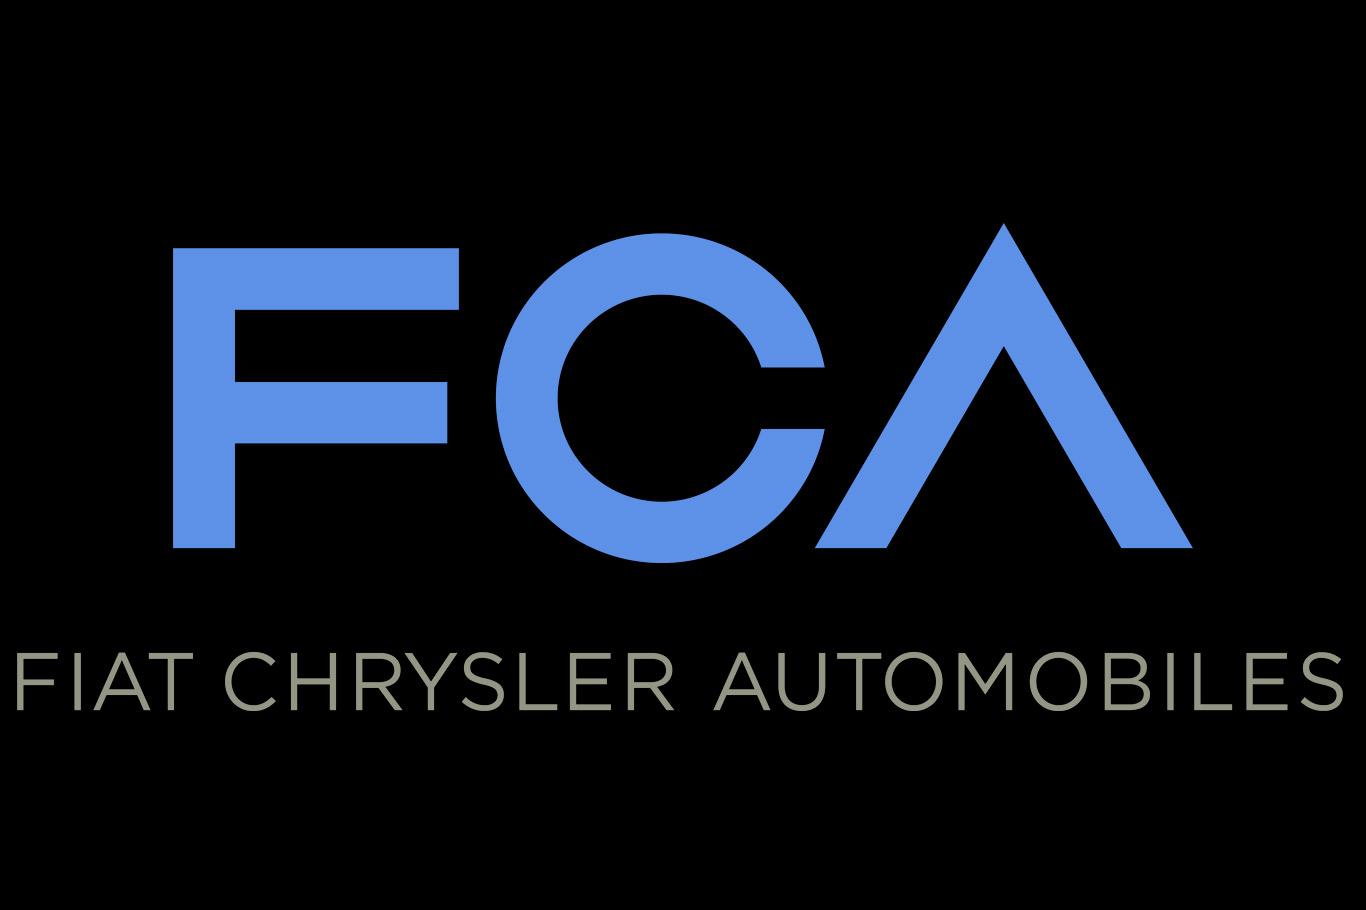 Chrysler >> Fca Logos